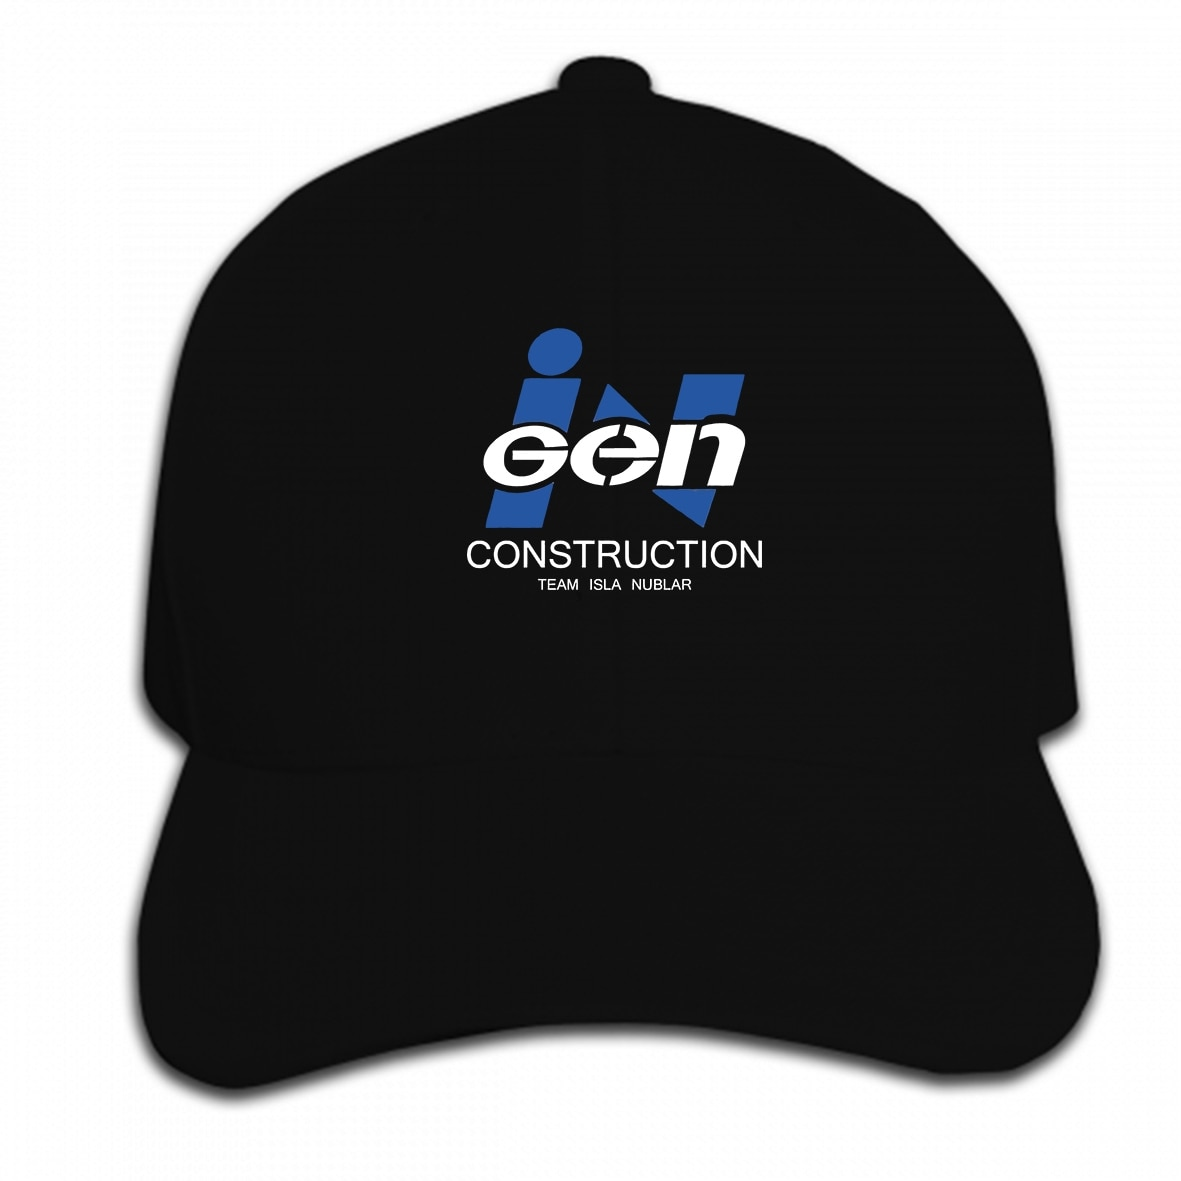 Impresión de encargo gorra de béisbol Ingen equipo de construcción sombrero personalizado gorra